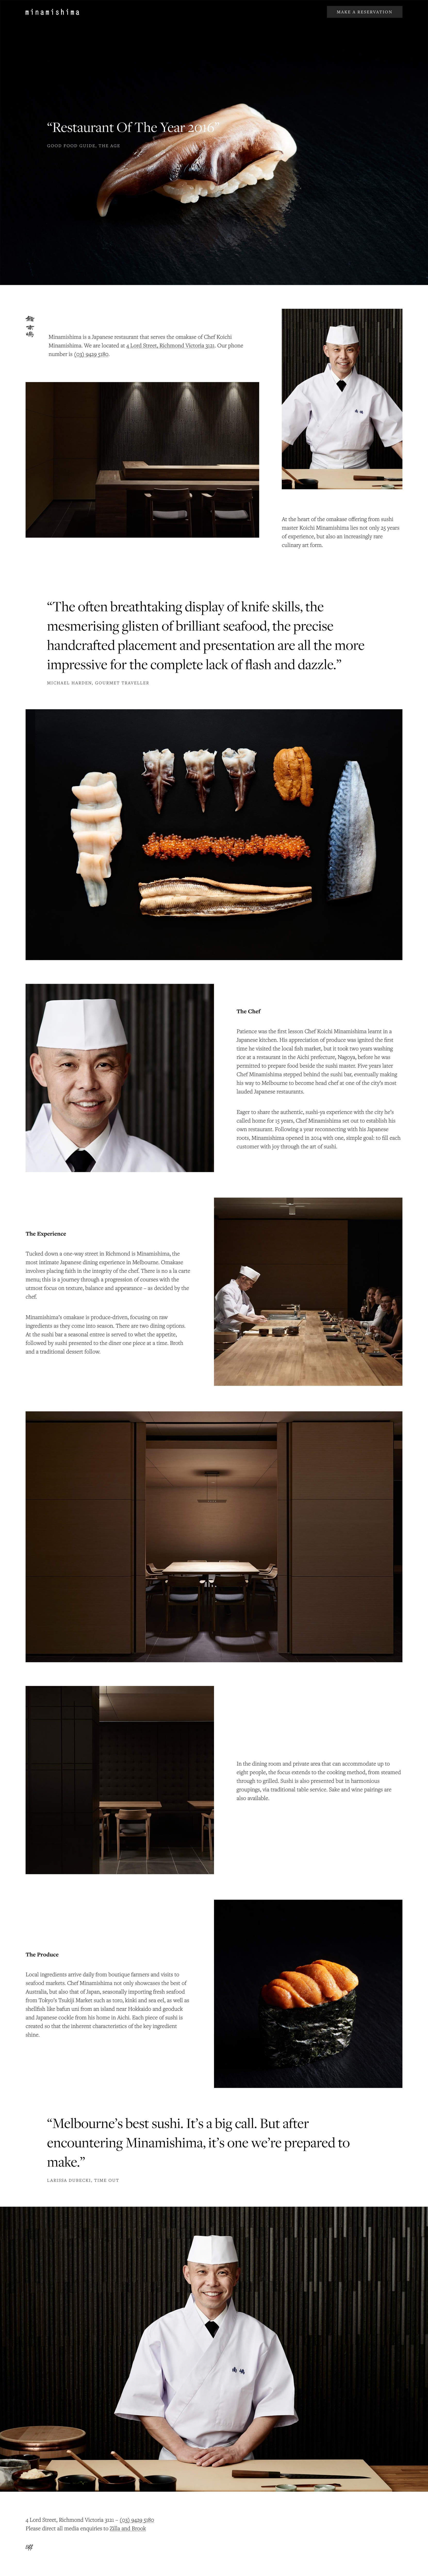 Minamishima Website Screenshot